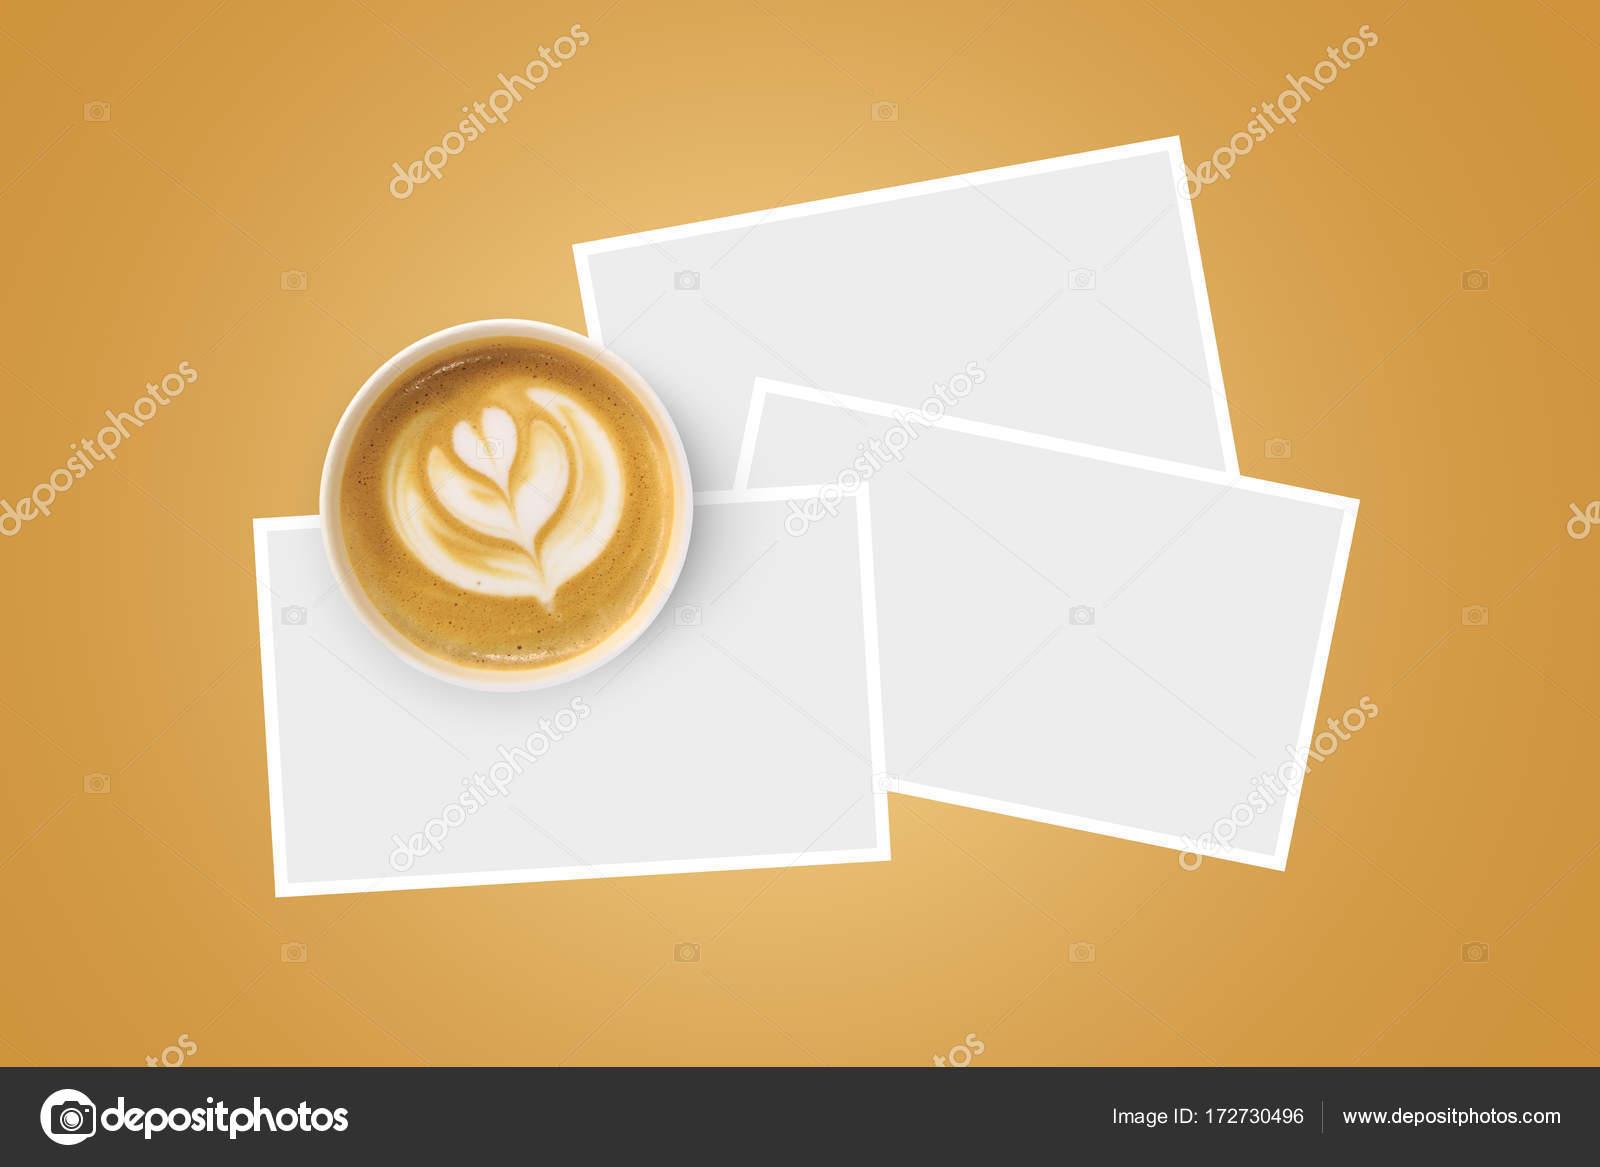 Geformte Tasse Kaffee mit Papprahmen — Stockfoto © niglaynike #172730496